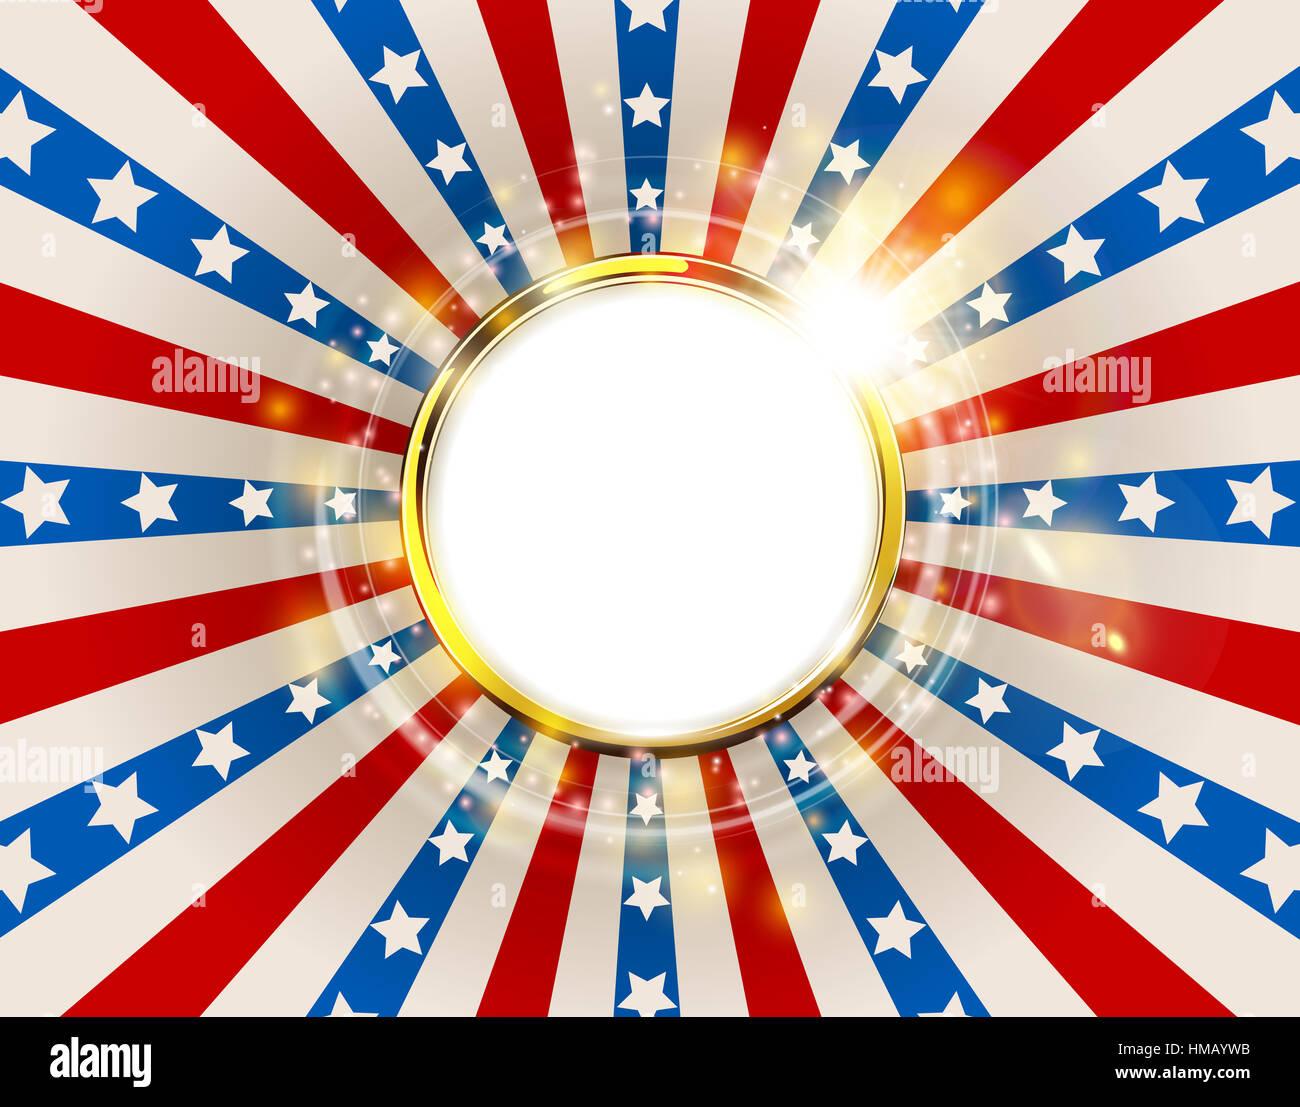 Großzügig Amerikanische Flagge Färbung Galerie - Entry Level Resume ...